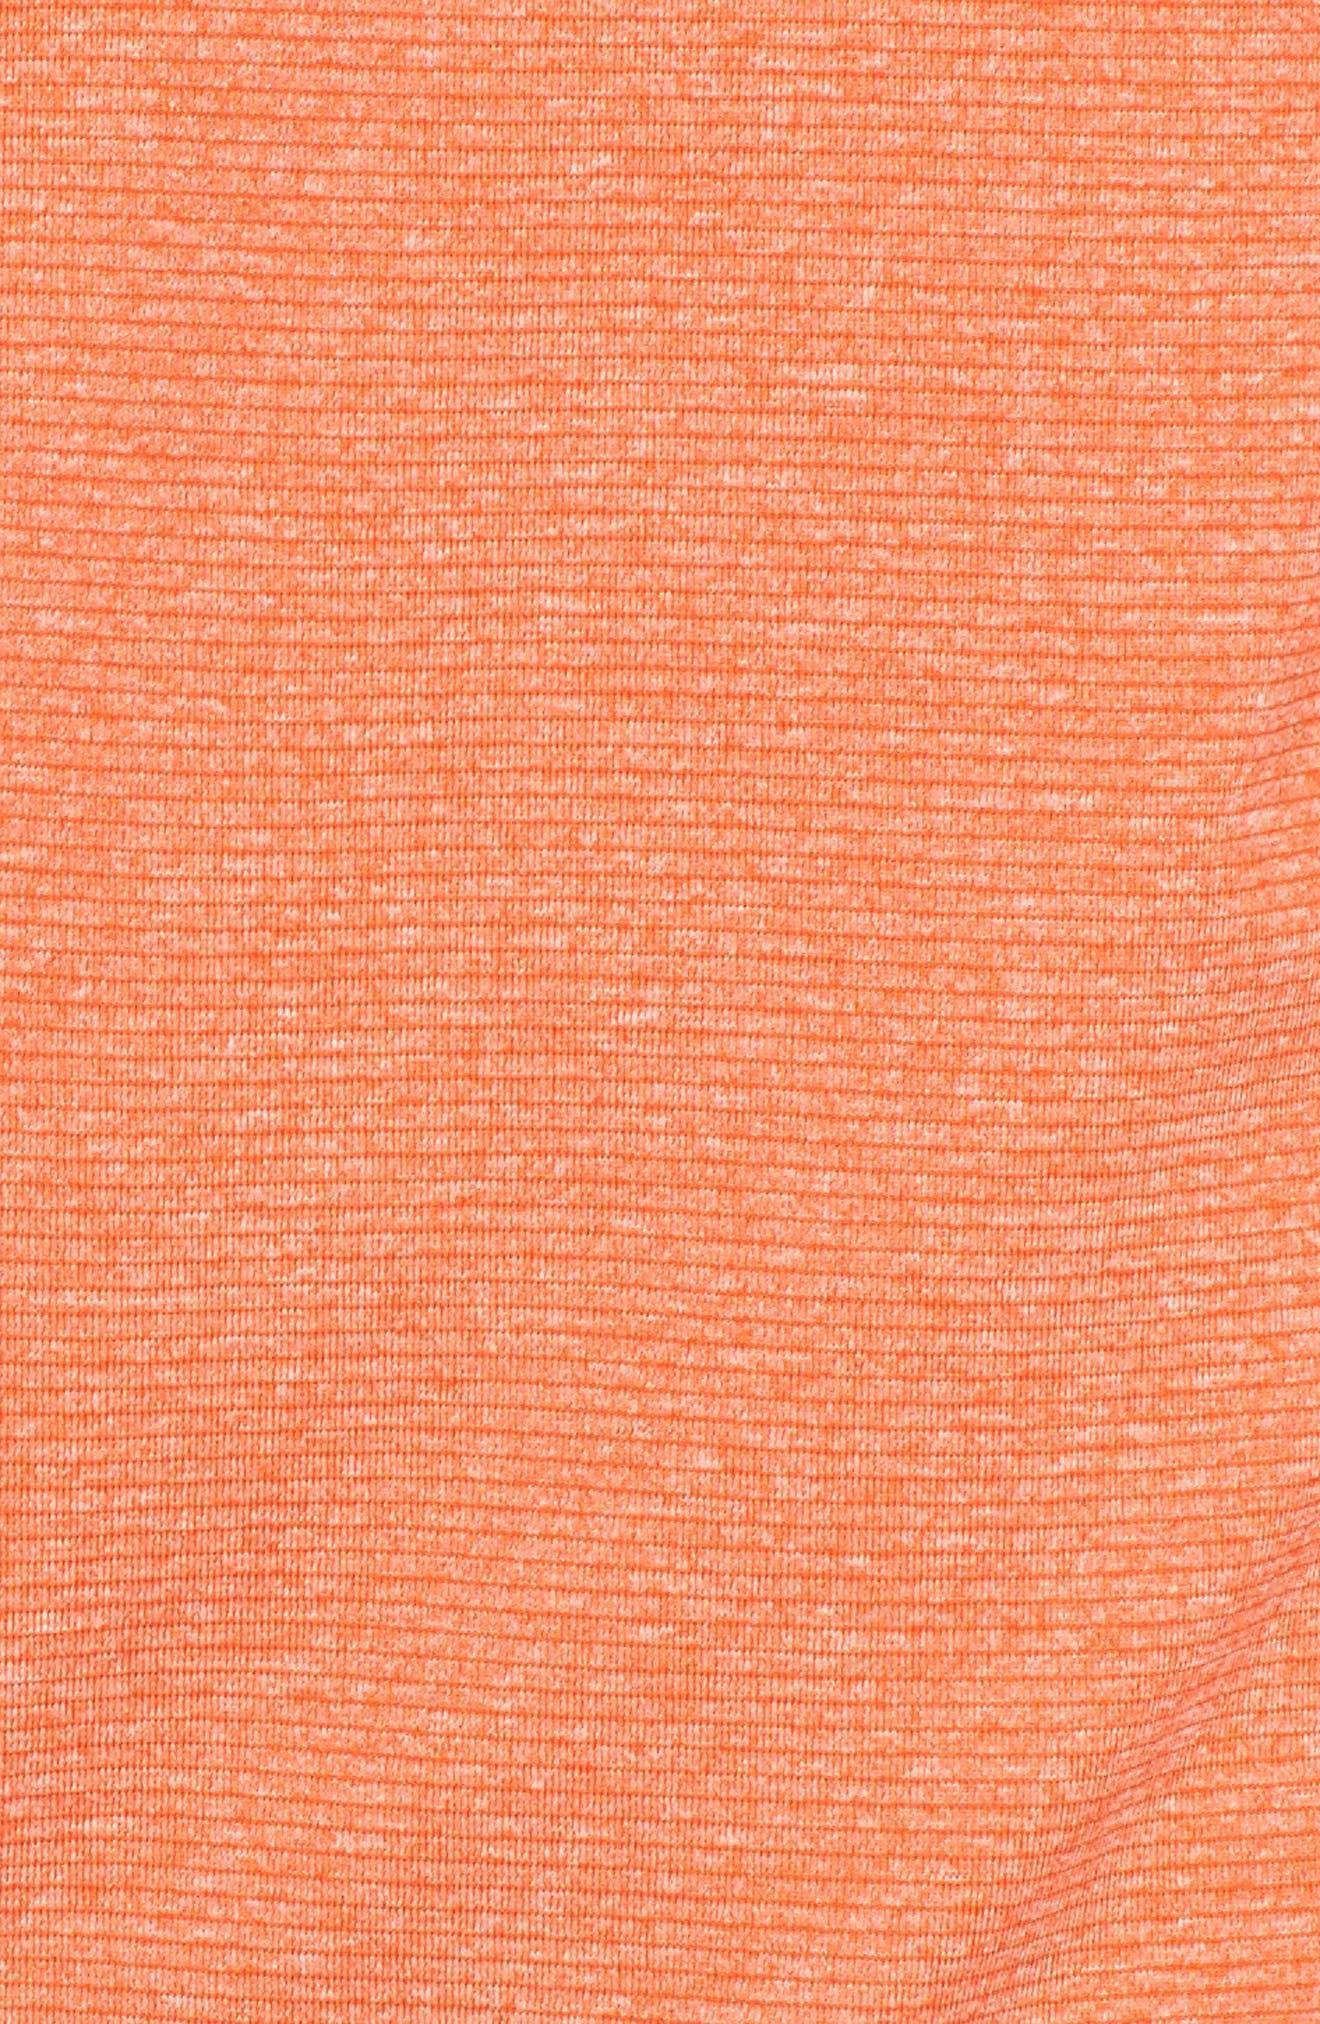 Shoreline - Denver Broncos Half Zip Pullover,                             Alternate thumbnail 5, color,                             College Orange Heather